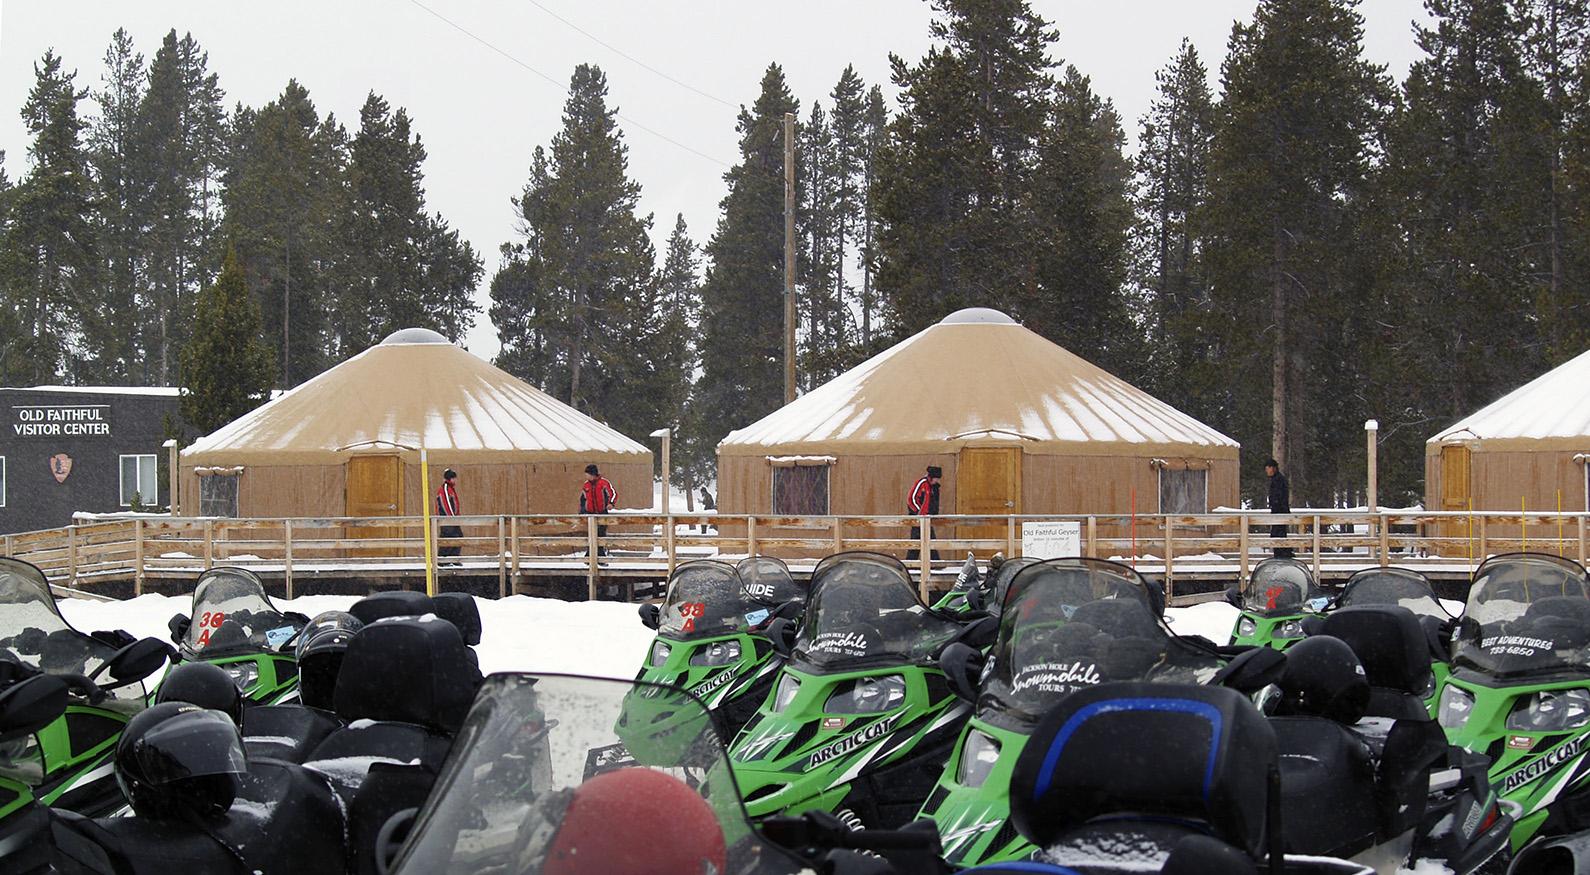 Pacific-Yurts-at-Yellowstone.jpg